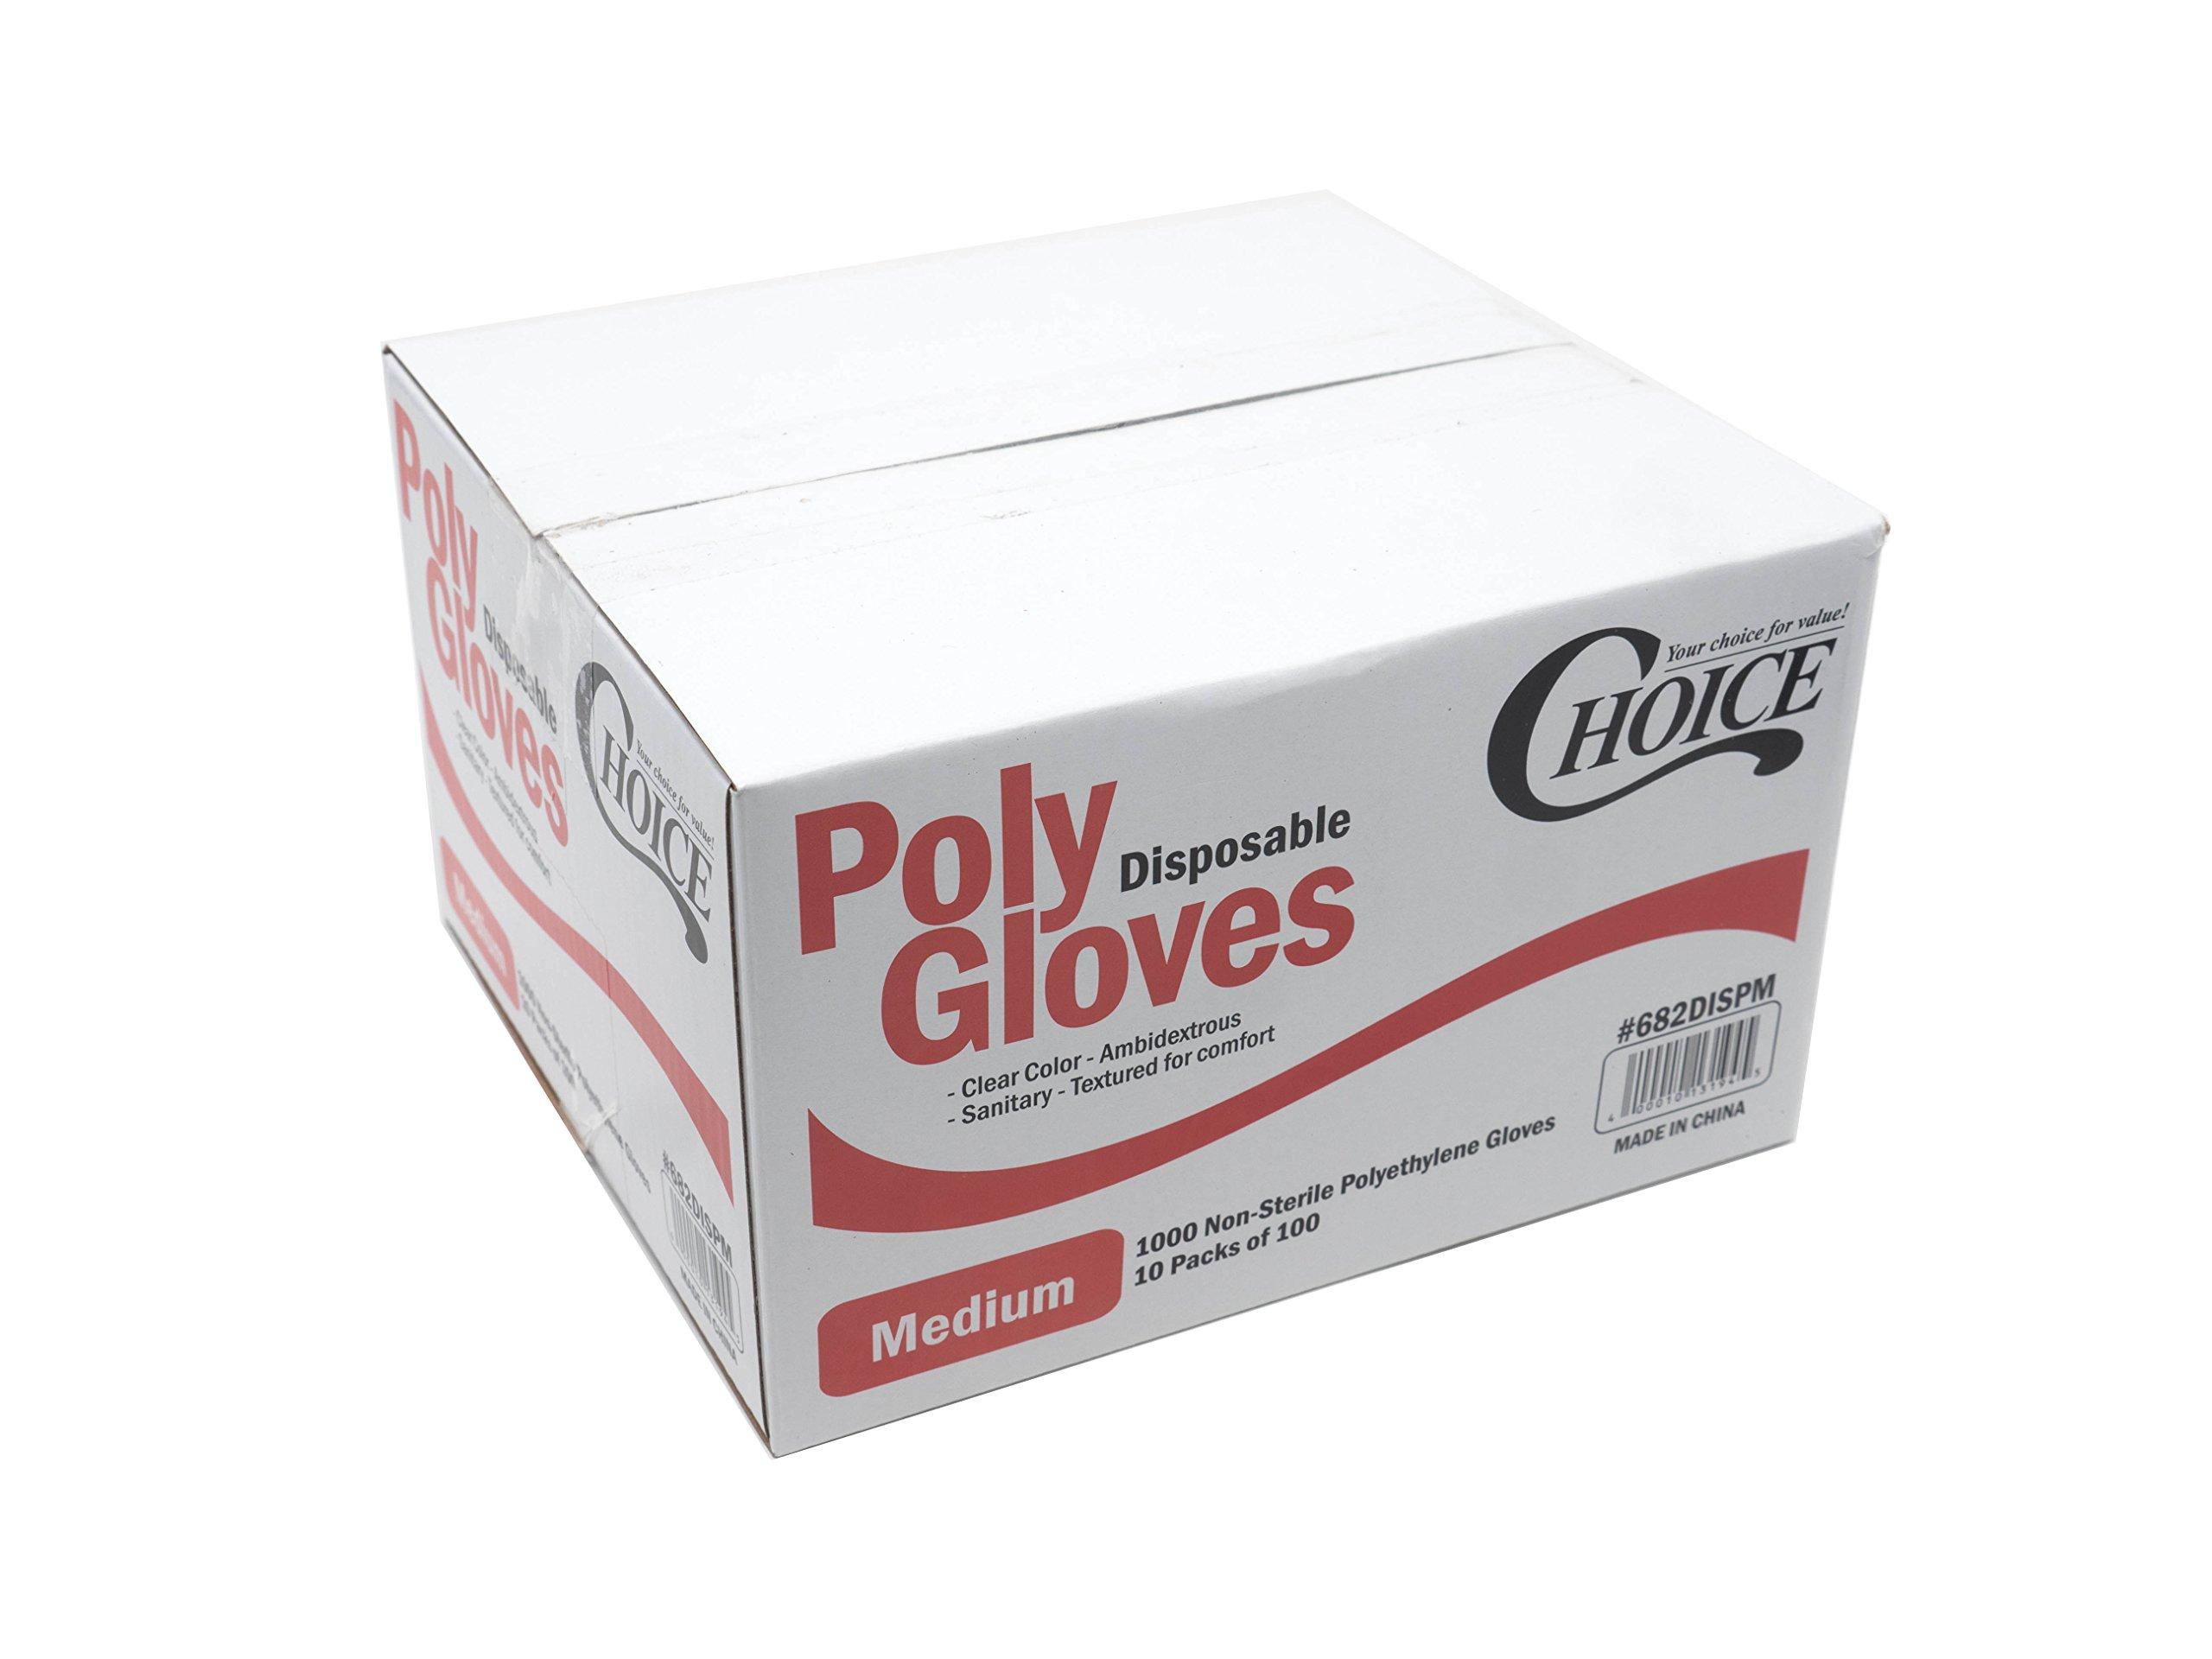 Choice Poly Disposable Polyethylene Gloves (Pack of 1000 - Medium)